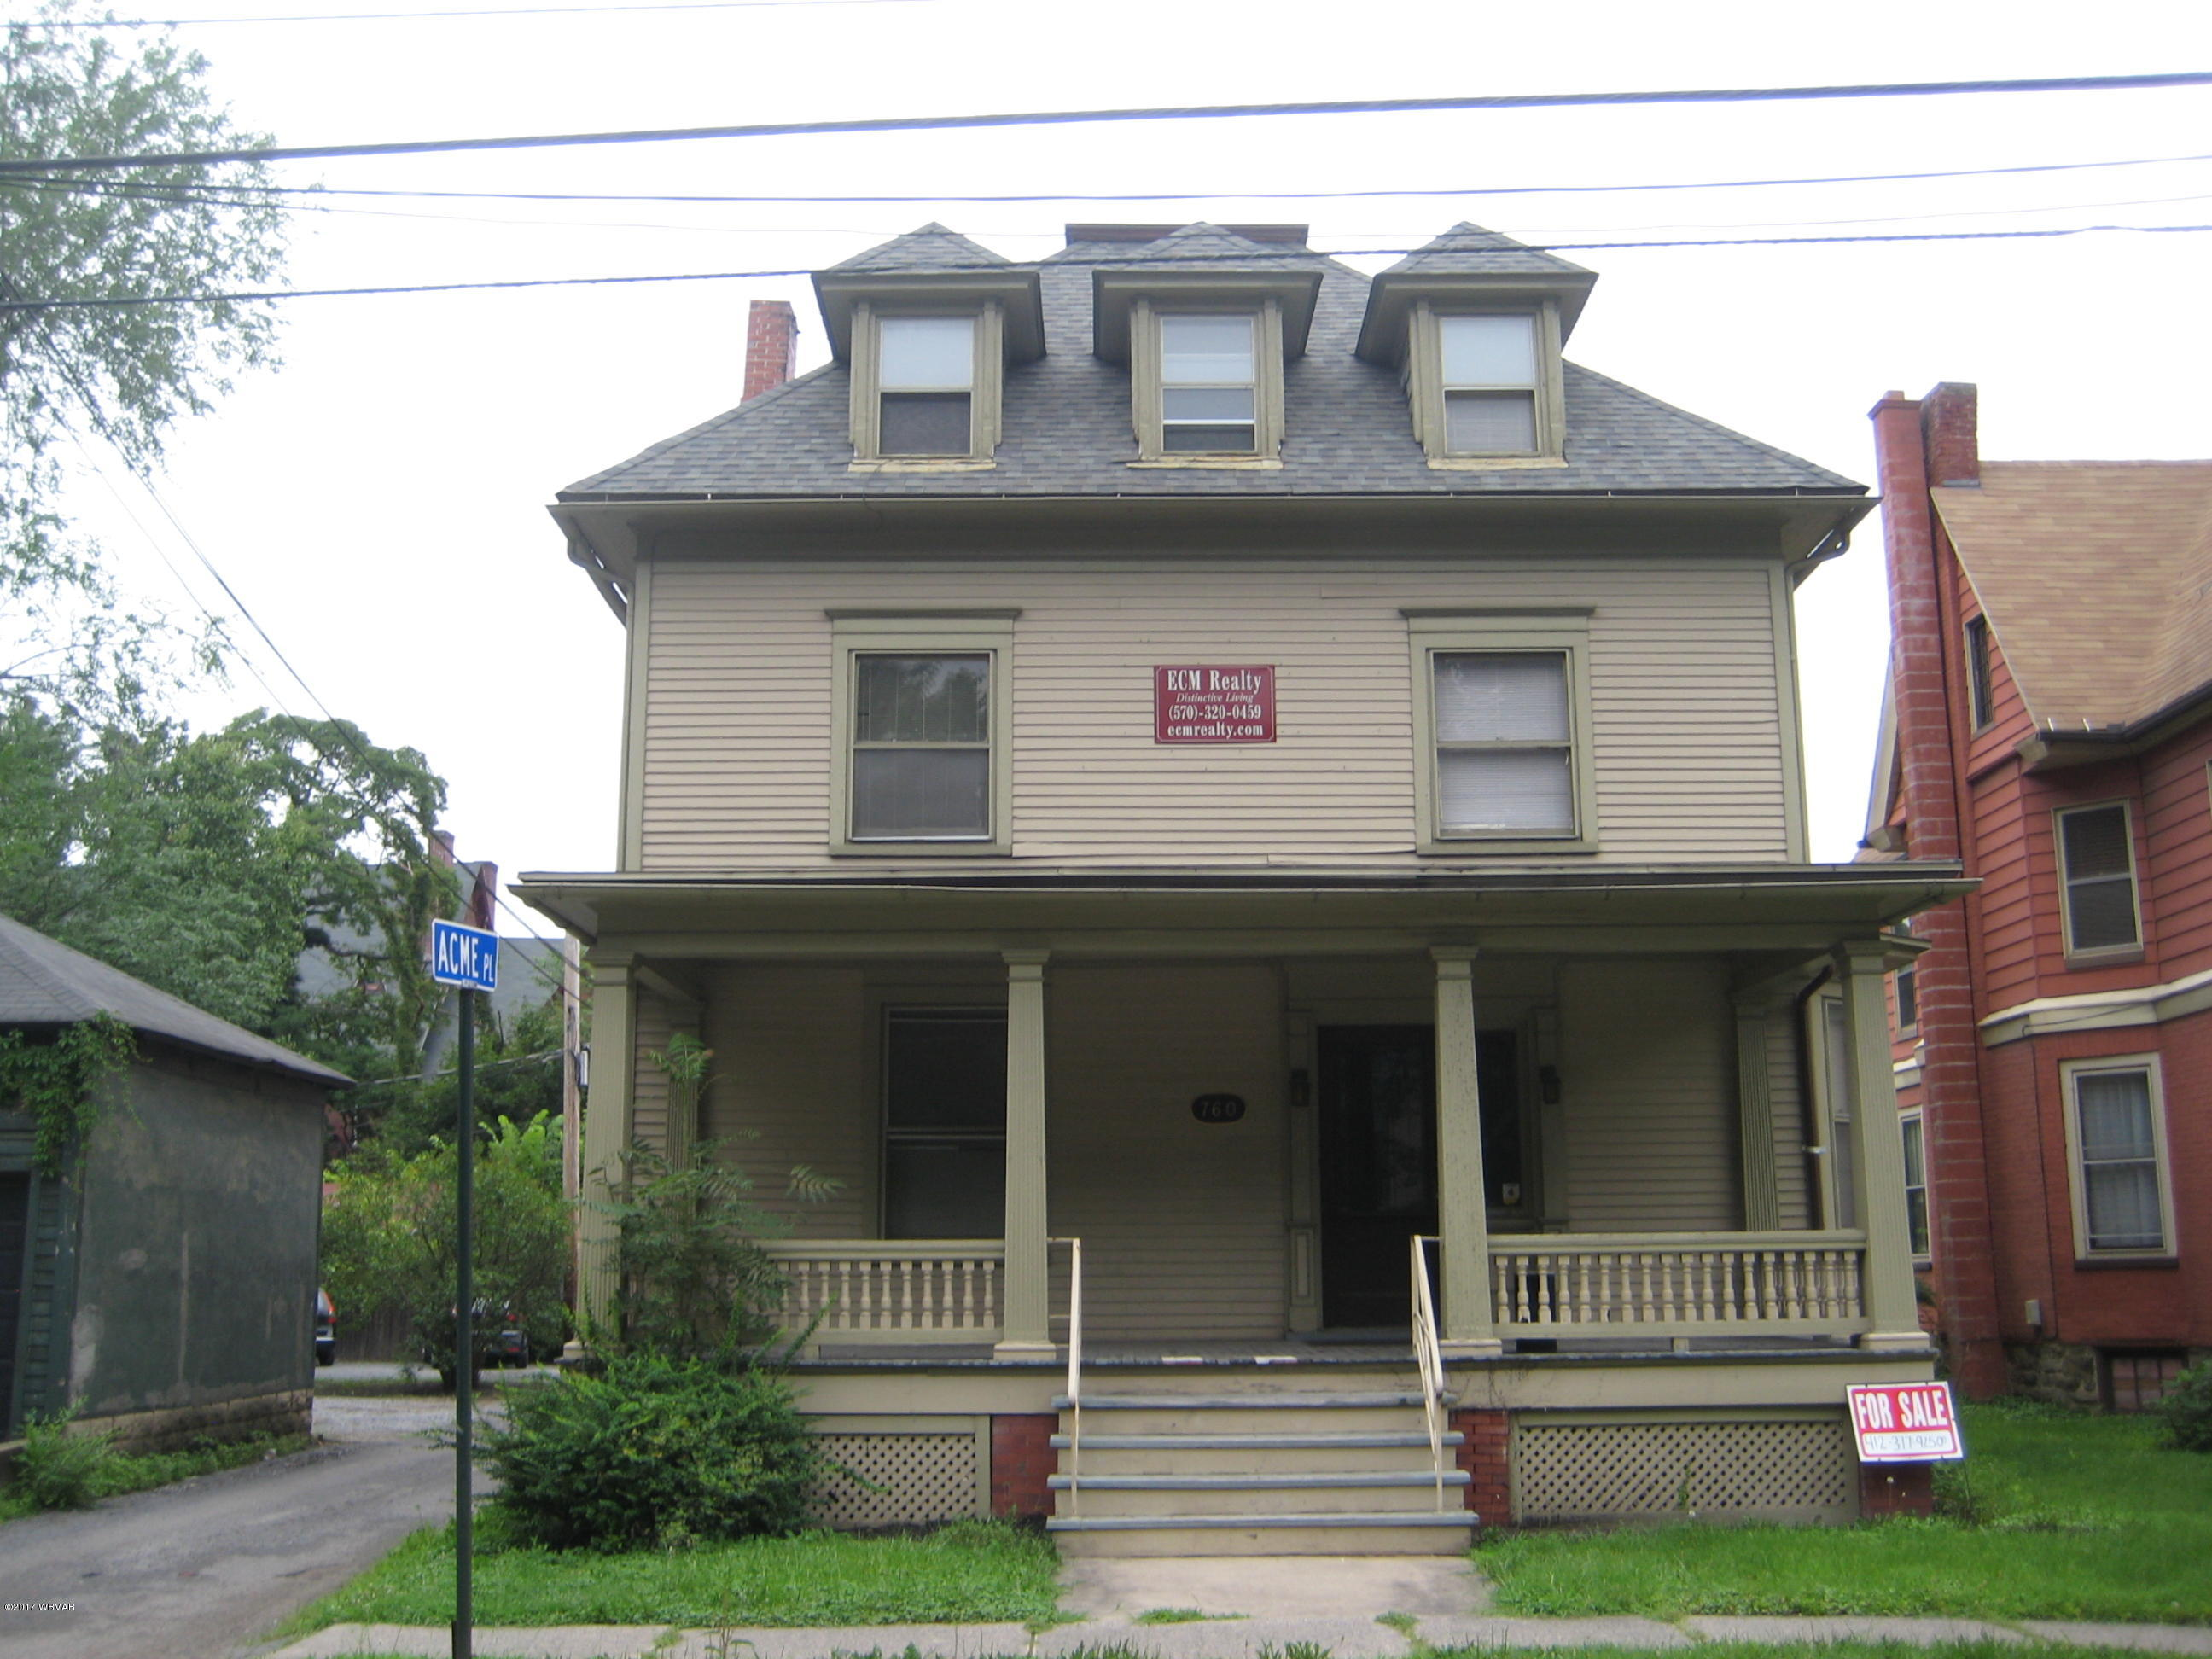 Williamsport,PA 17701,9 Bedrooms Bedrooms,3 BathroomsBathrooms,Residential,WB-81667